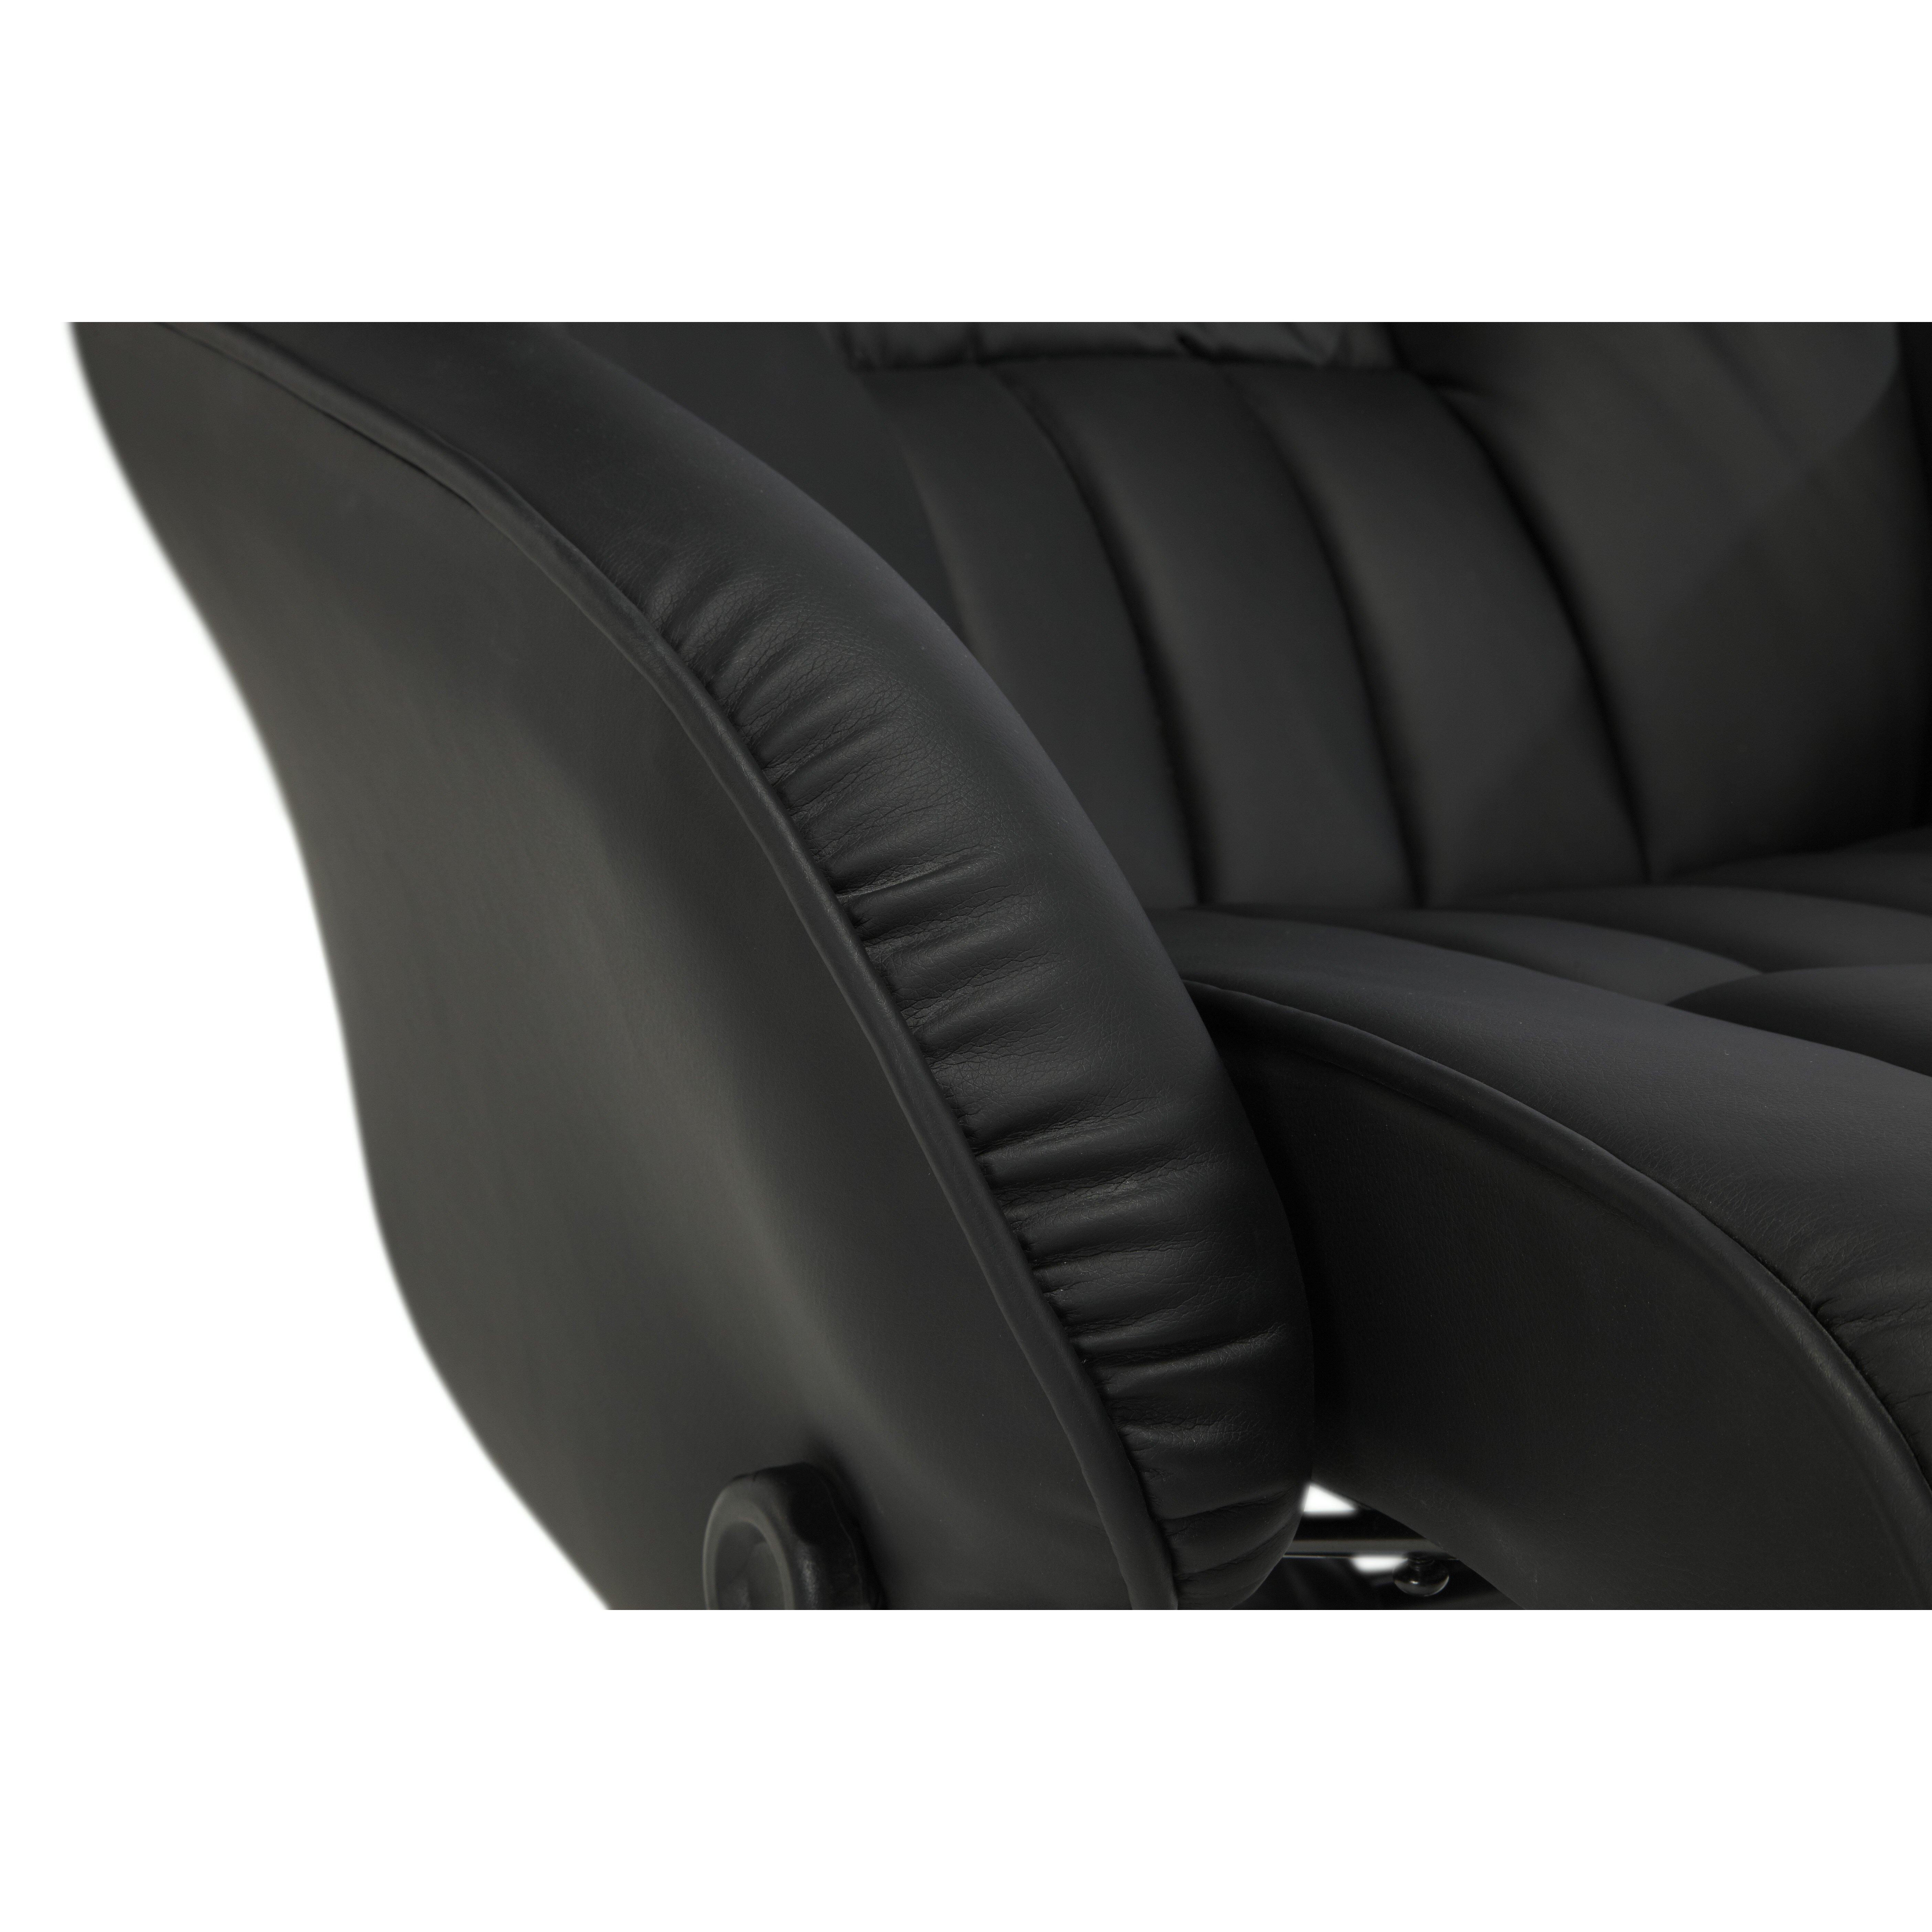 Home Haus Nairne Recliner Footstool Green Bay Furniture Owner Craigslist